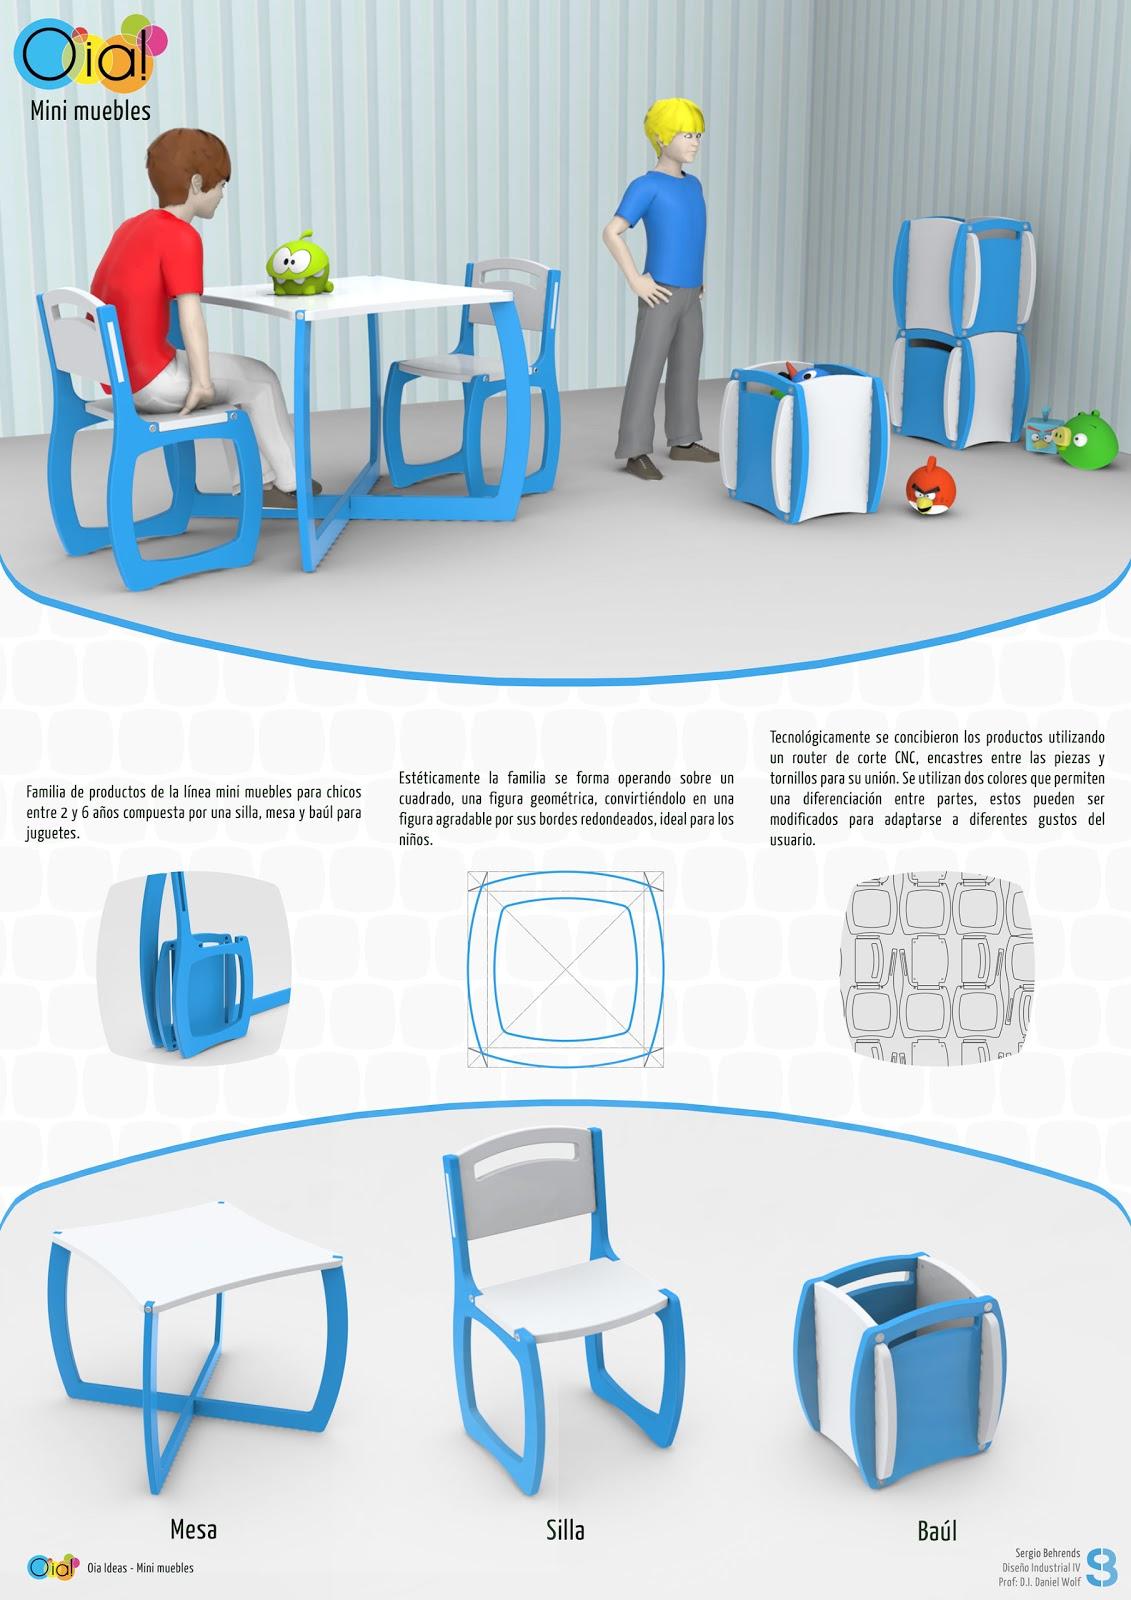 Dise o industrial up industrial design destacado dise o for Diseno industrial mobiliario